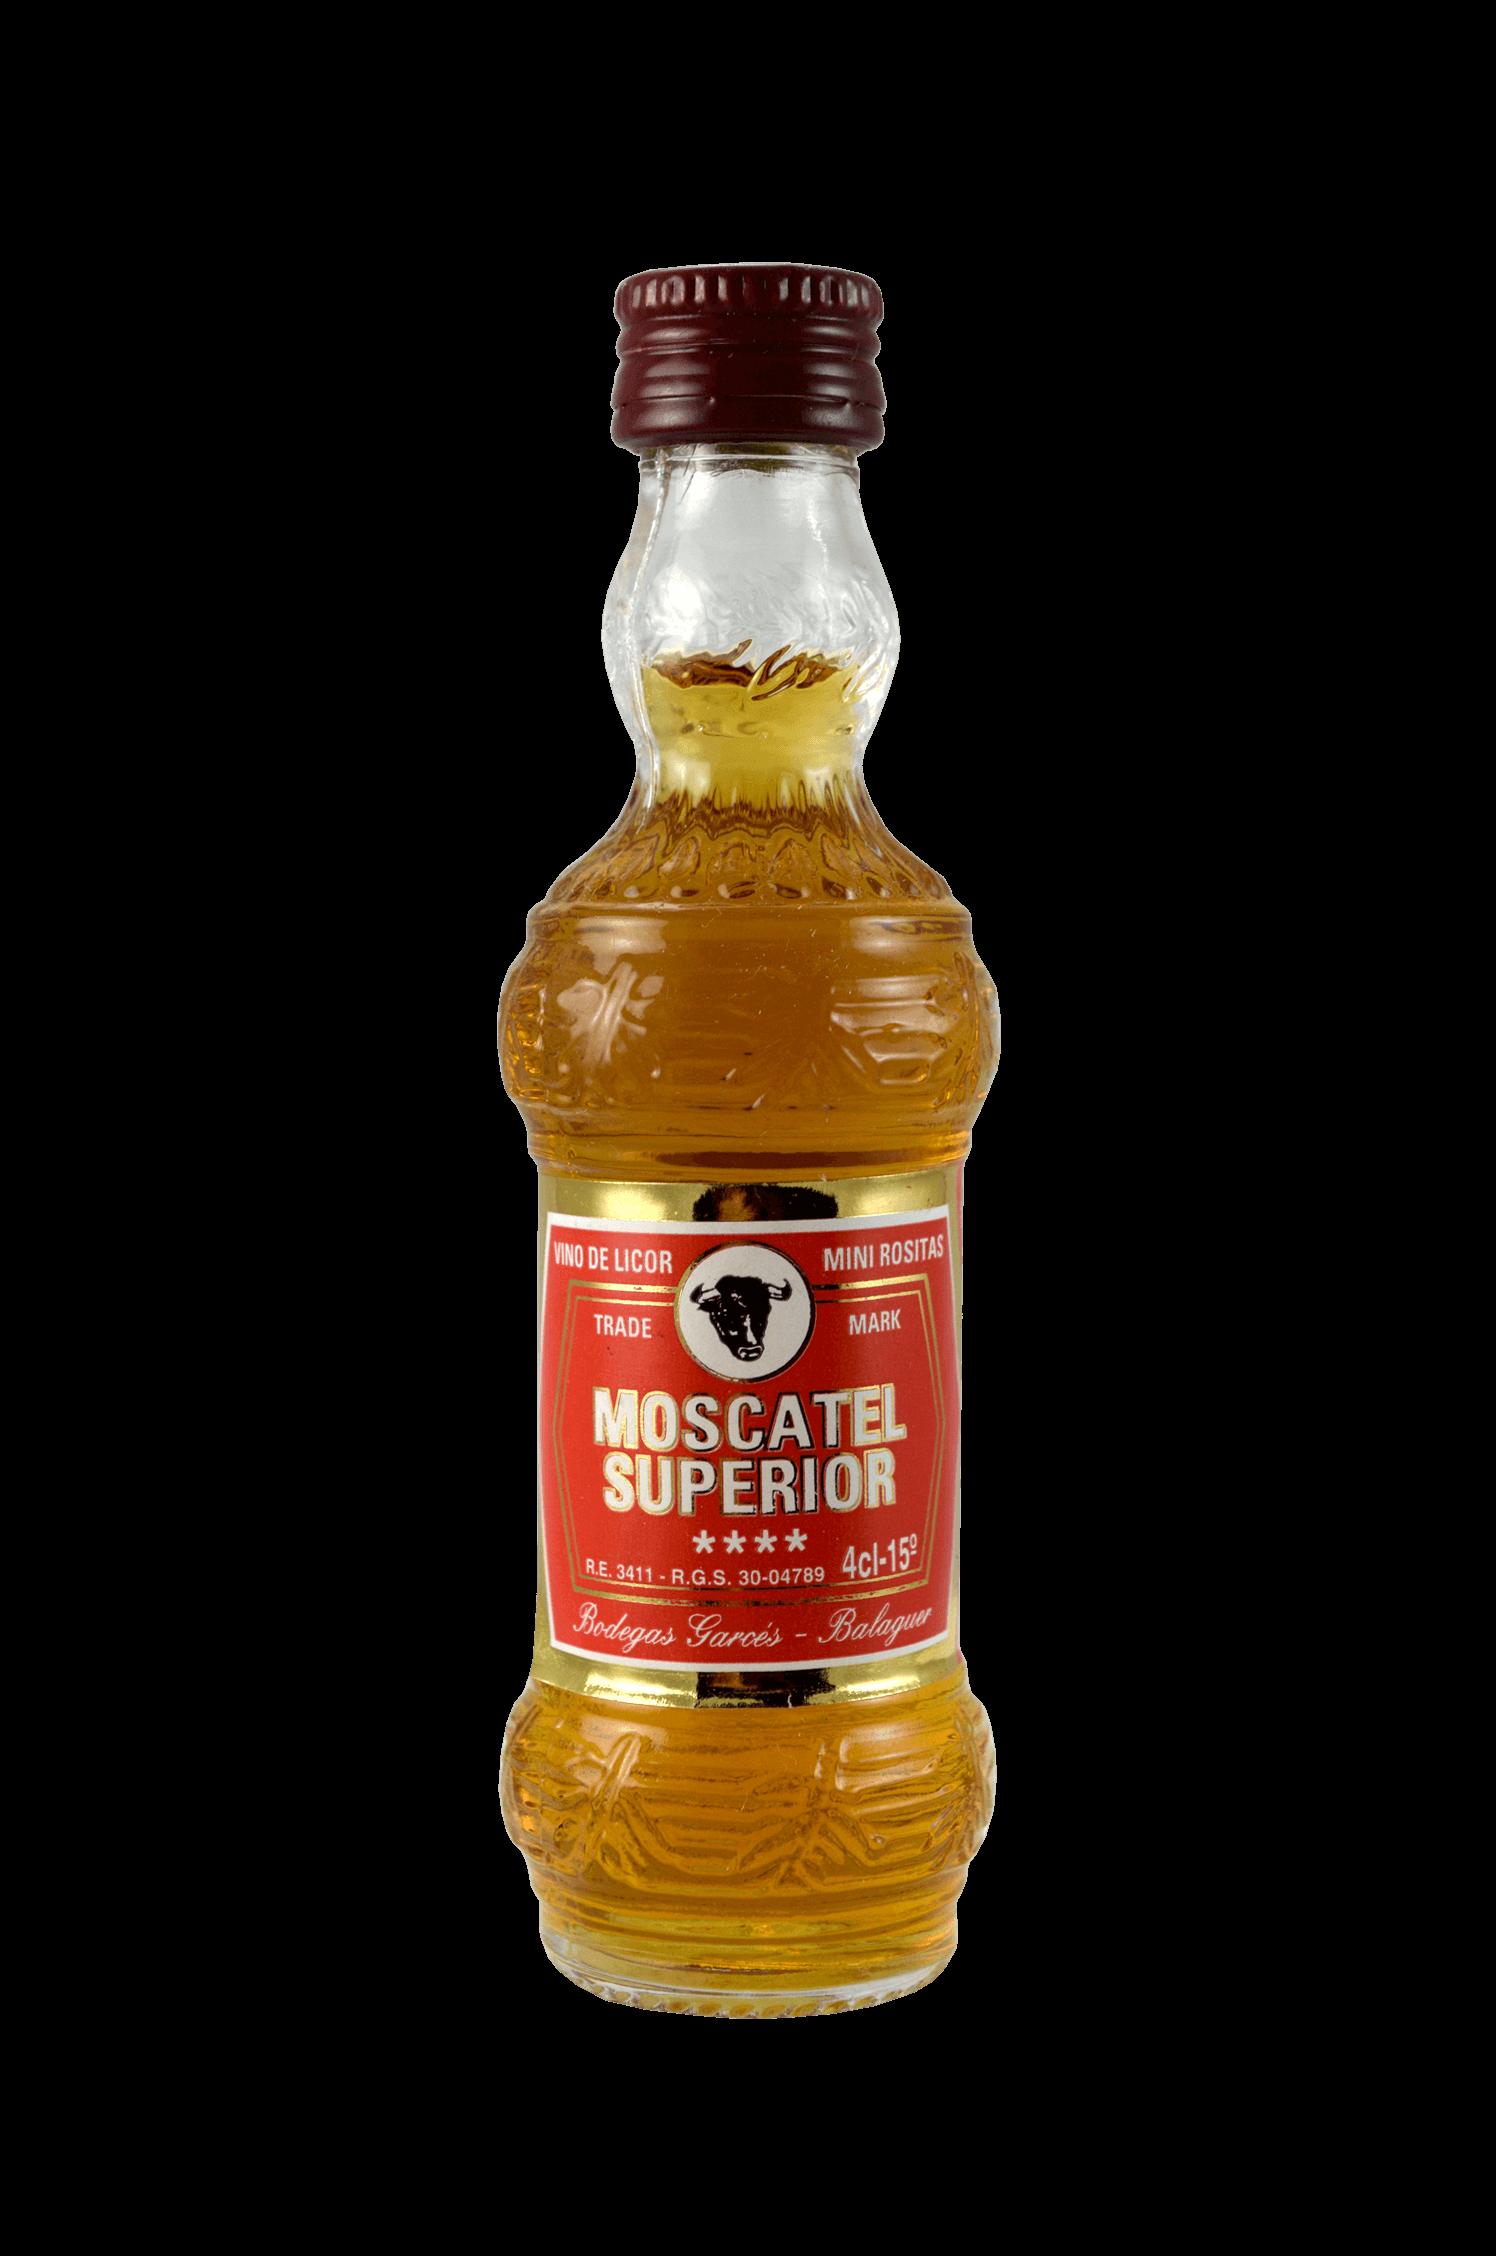 Moscatel Superior